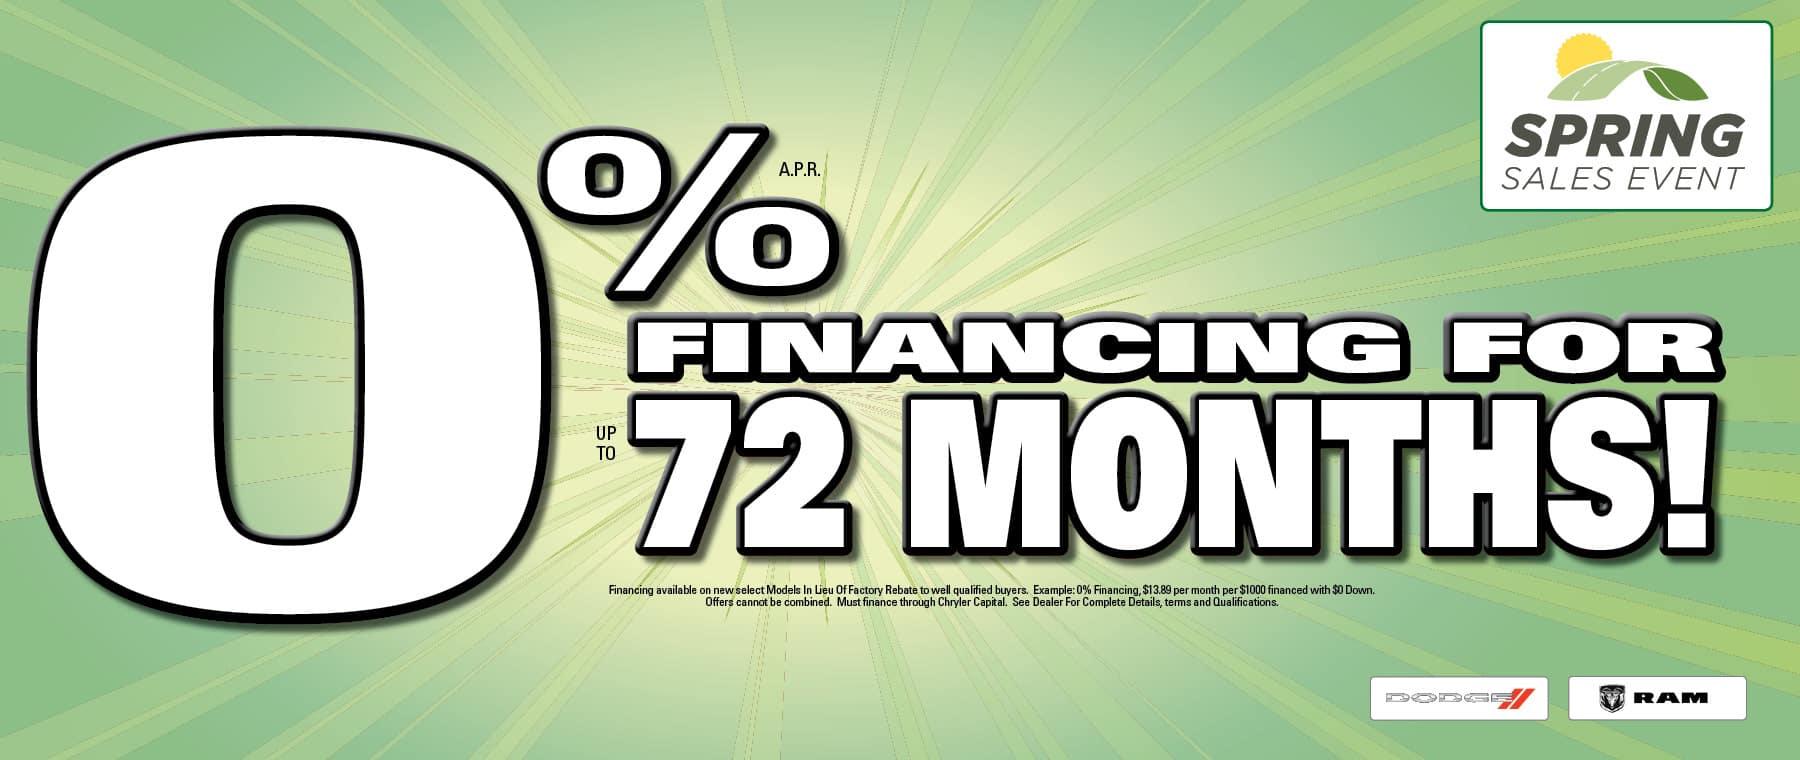 Great Financing at University Dodge RAM!